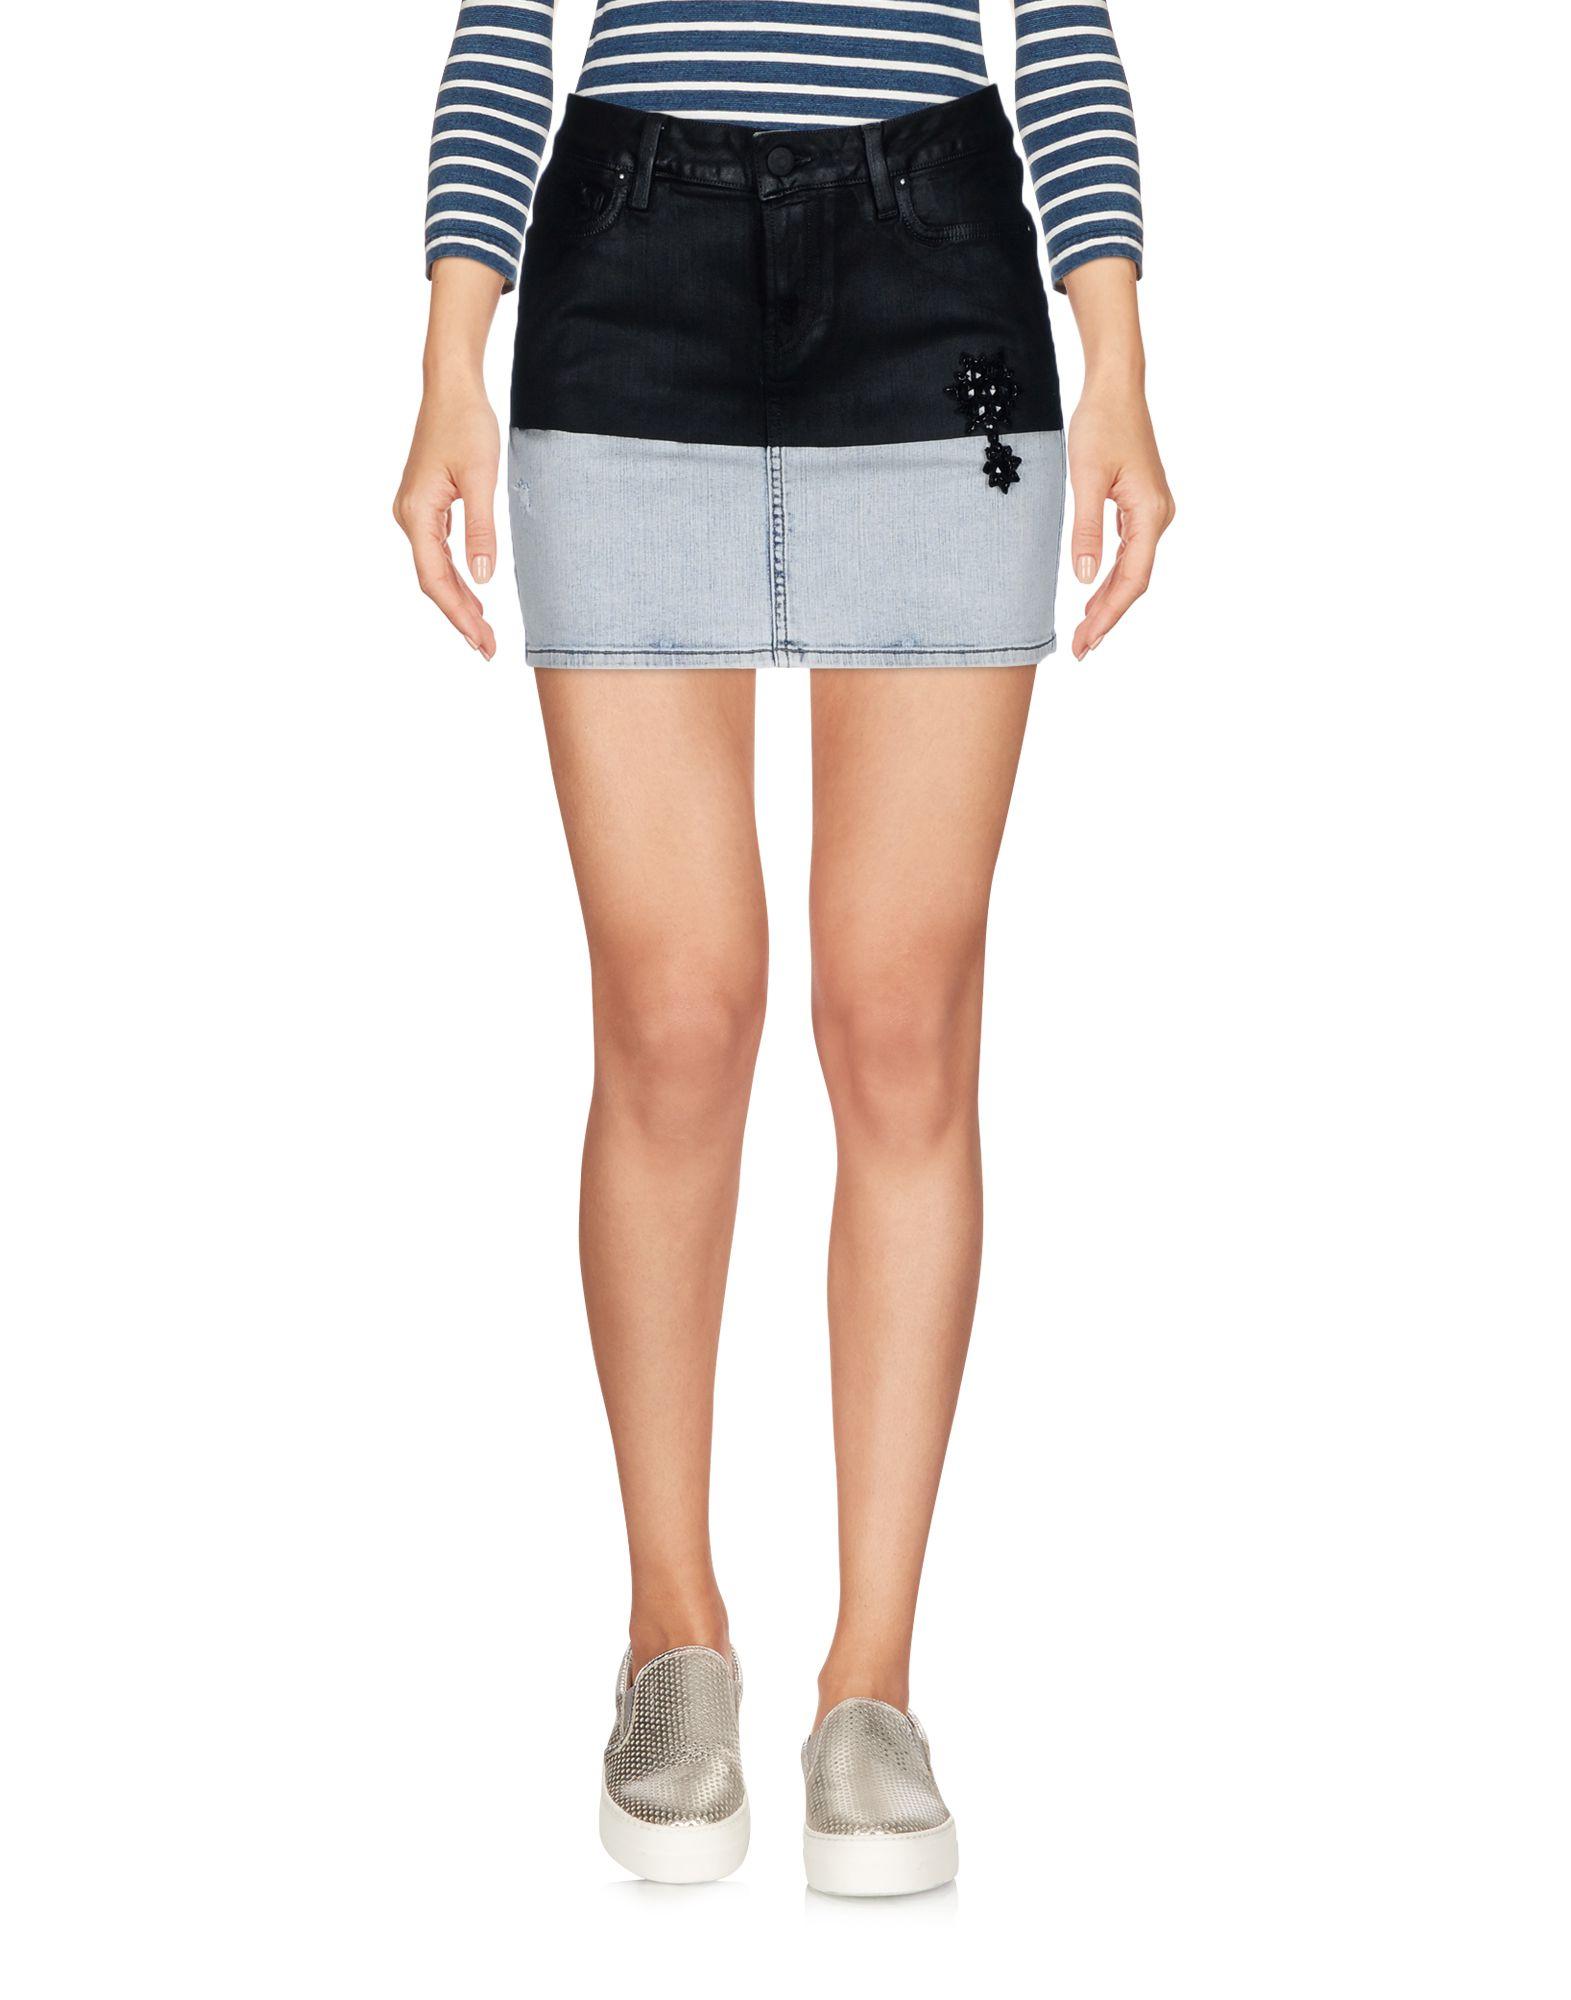 Фото - ROŸ ROGER'S Джинсовая юбка pieces джинсовая юбка